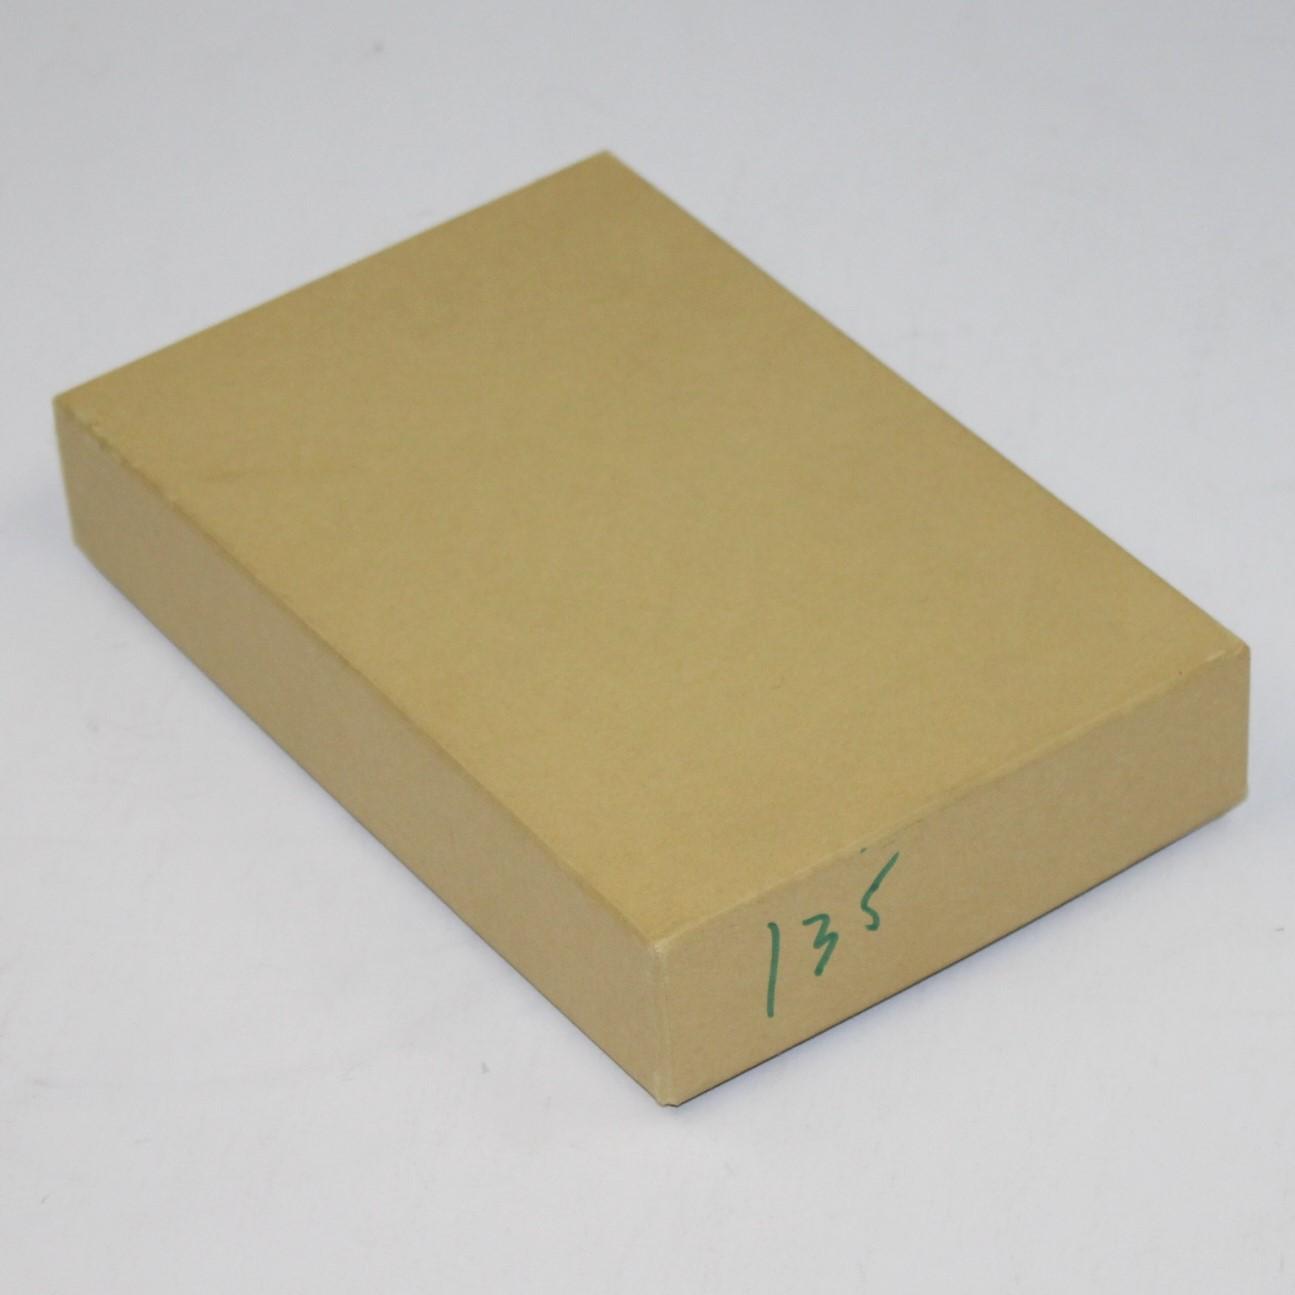 augusta national golf club complete bridge set original mint condition box compliments card - Golf Club Shipping Box